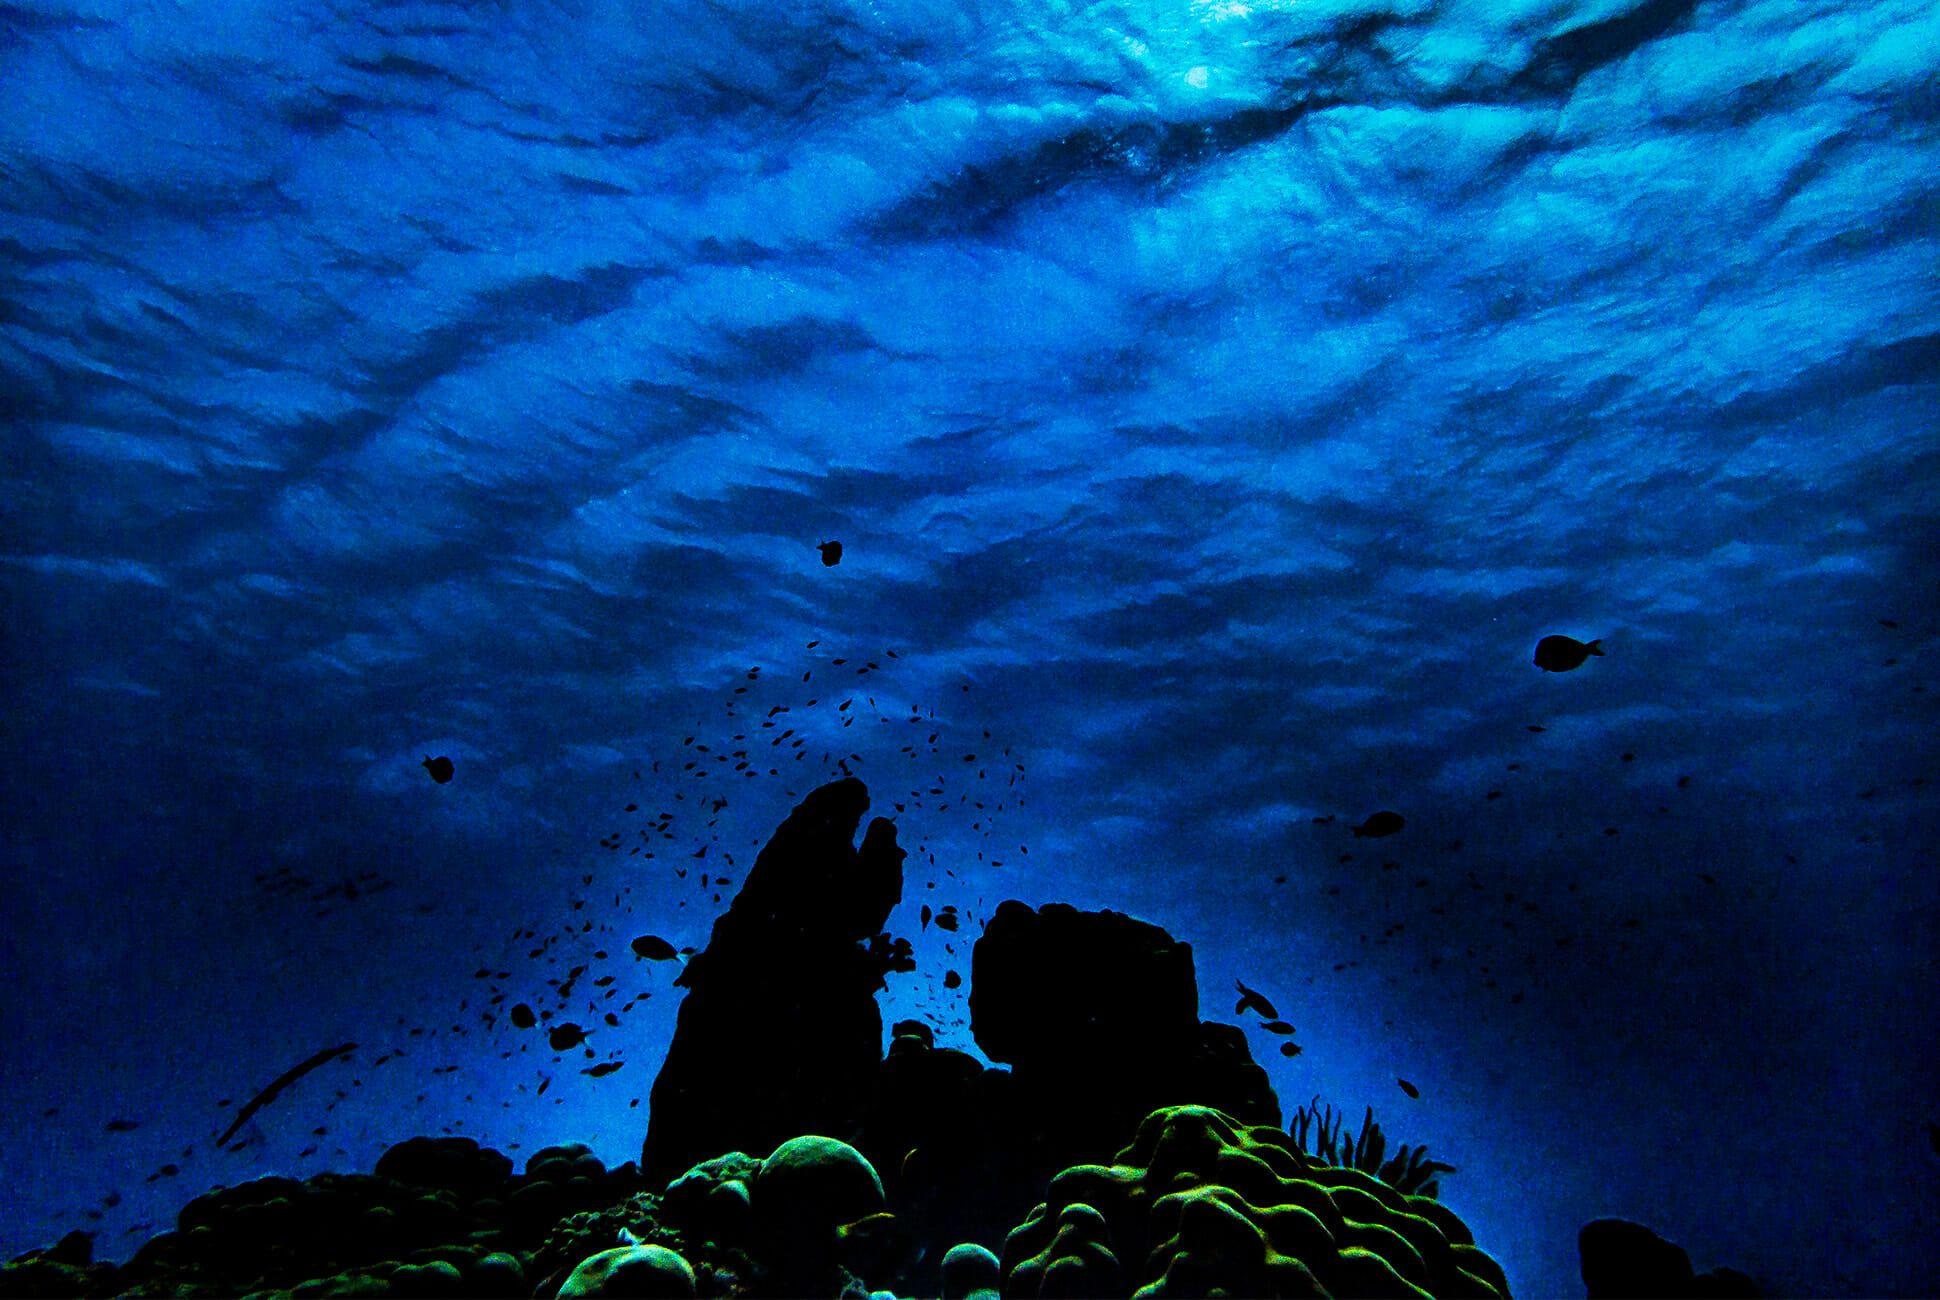 Diving-With-Doxa-Watches-in-Bonaire-gear-patrol-ocean-3